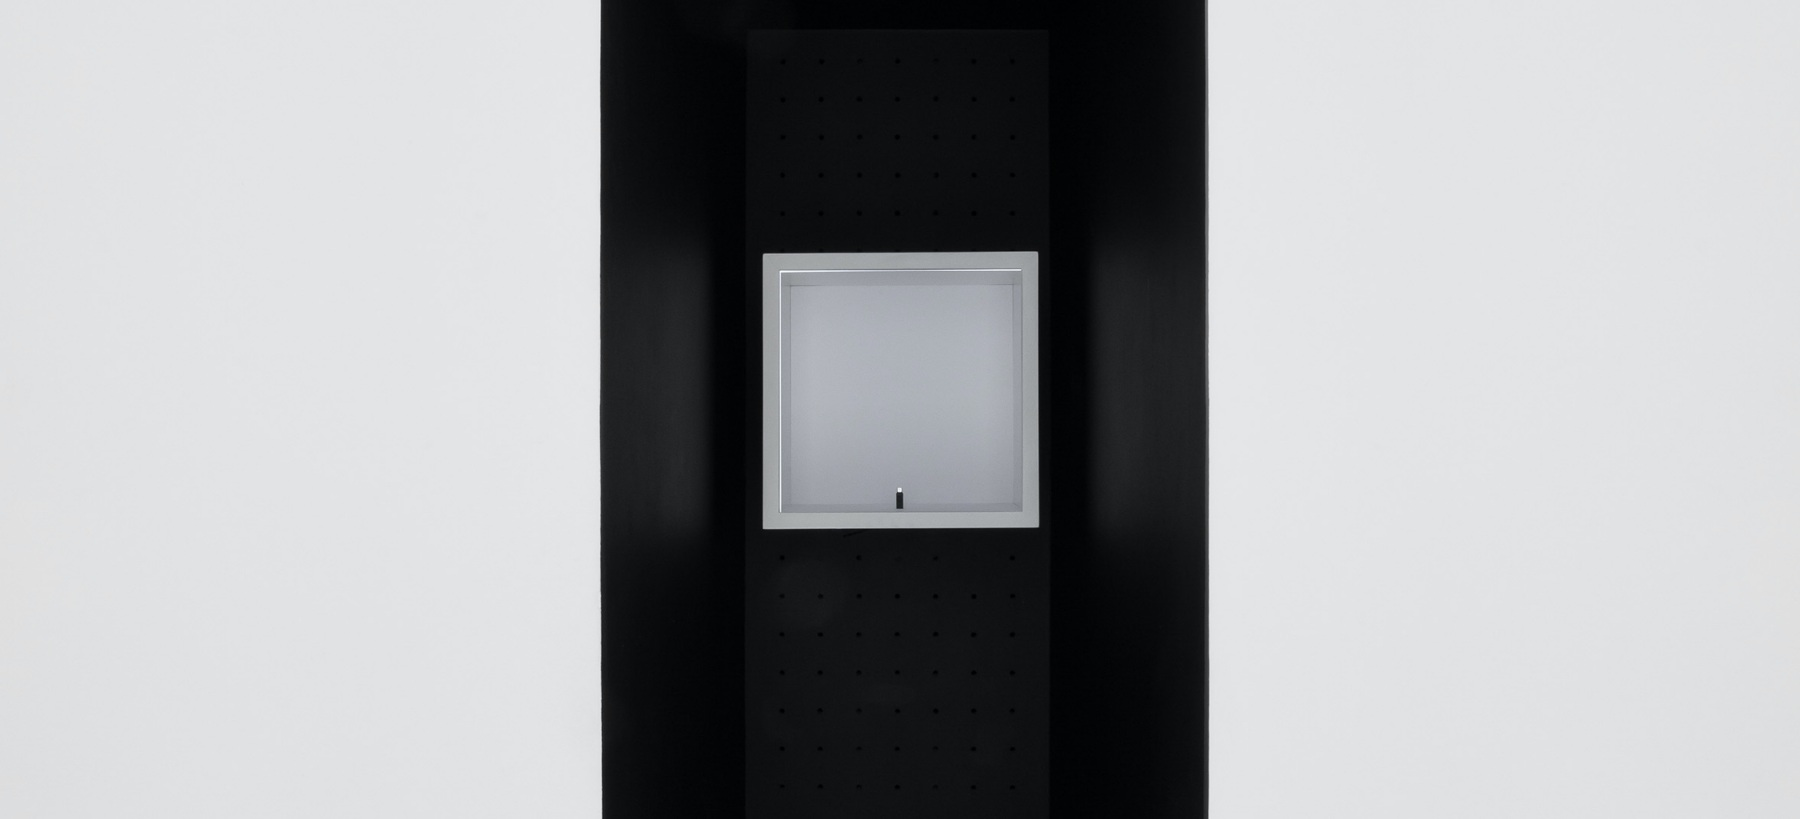 Abosch_The Box_PH1057_2021_installation view 3_300dpi